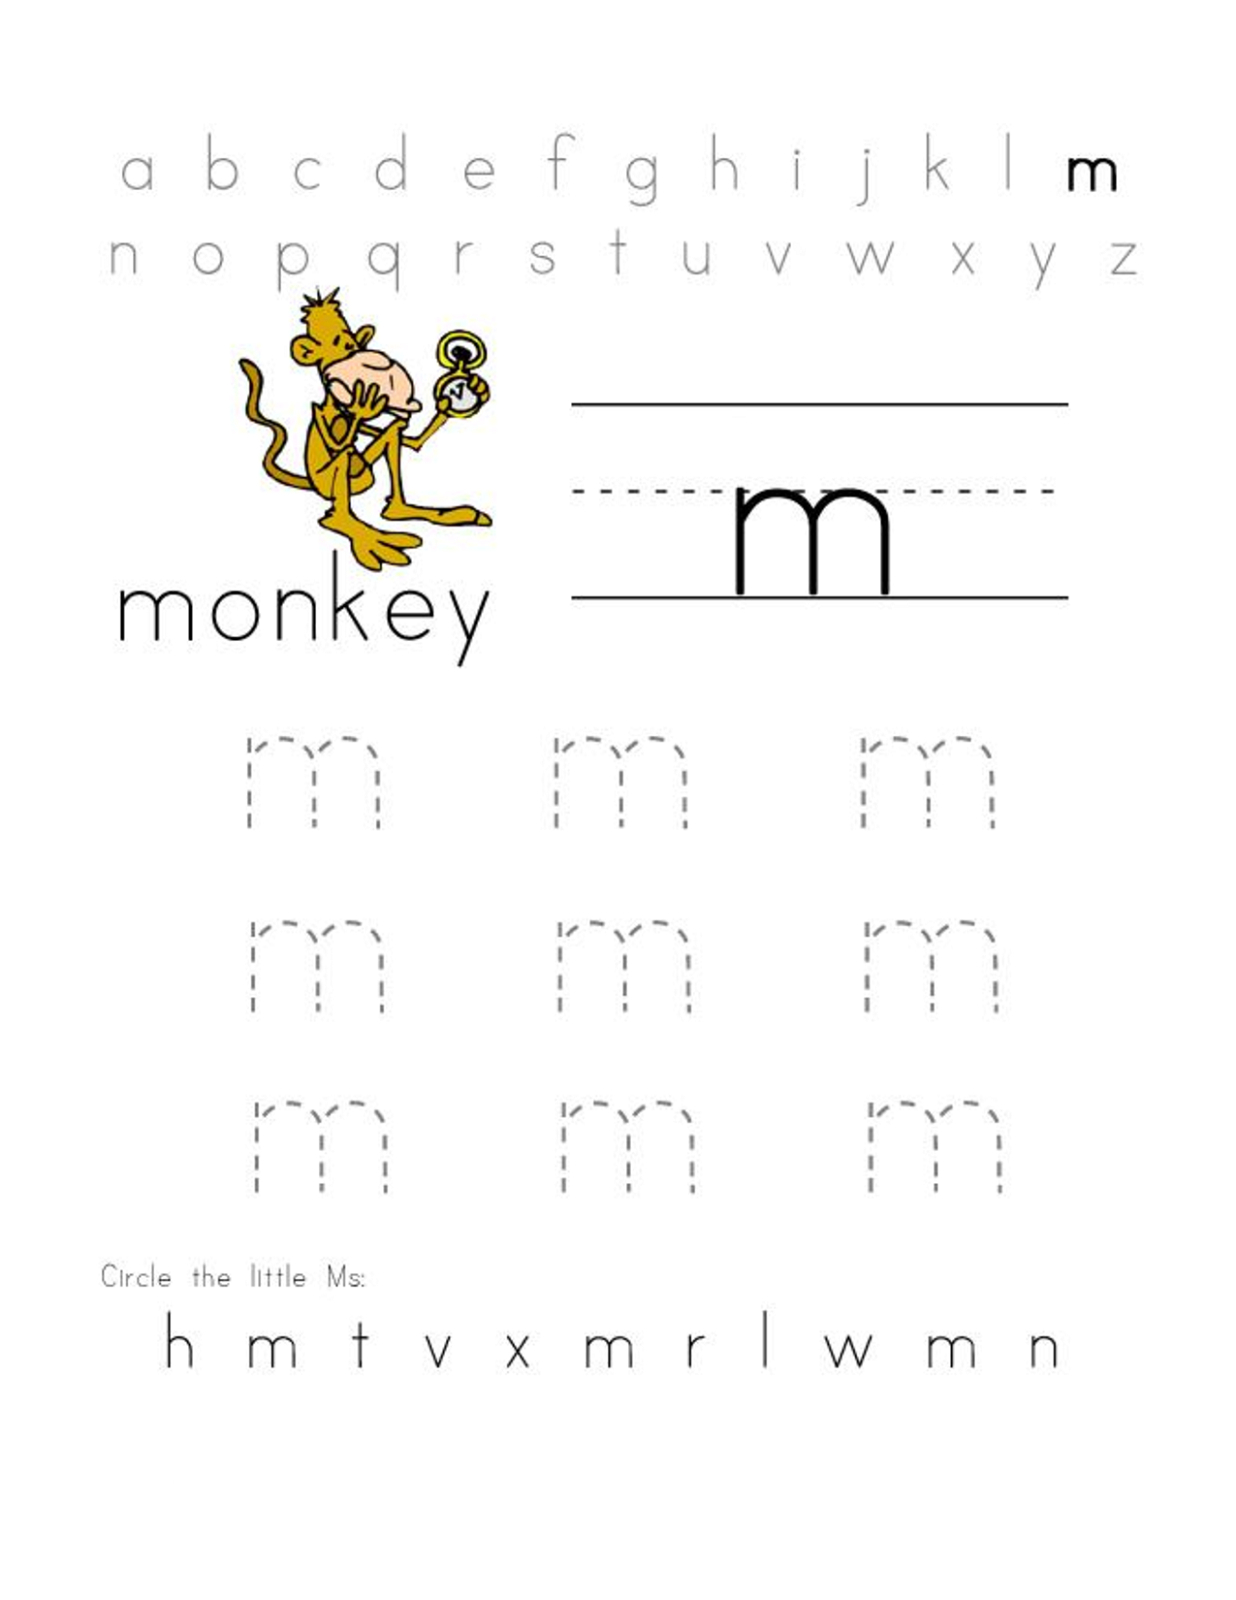 Letter M Worksheets   Activity Shelter - Letter M Puzzle Printable